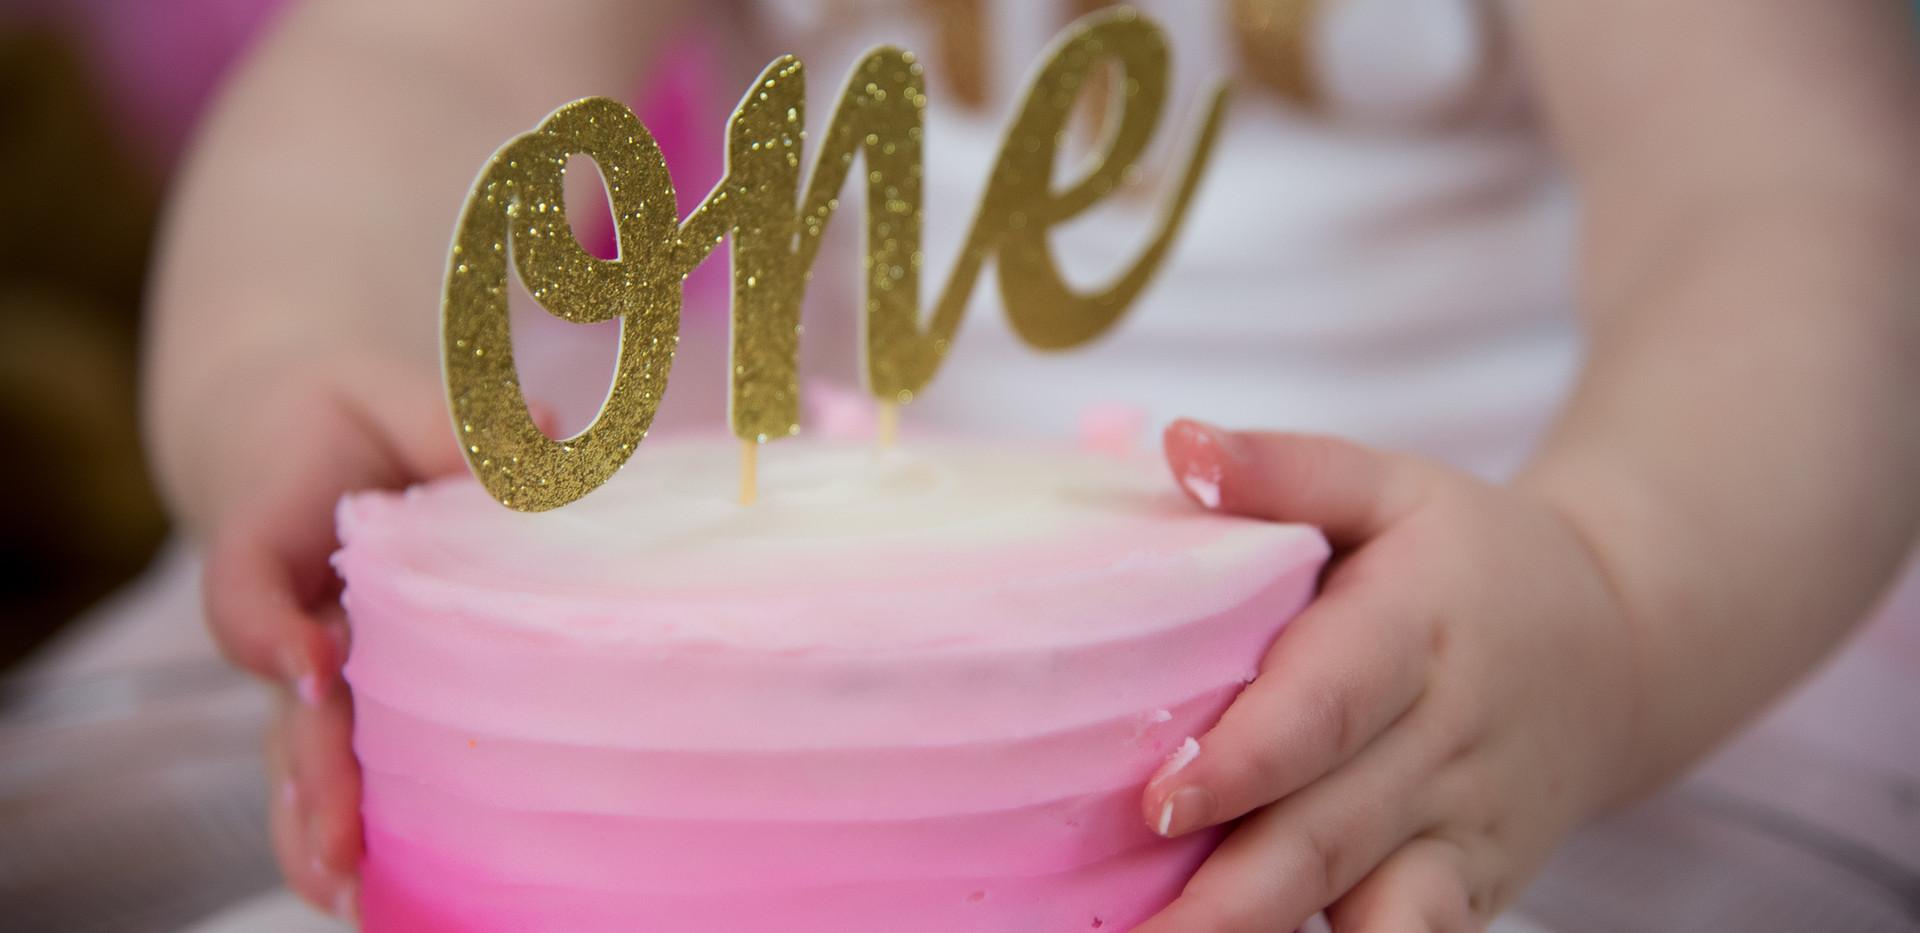 Visual Impressions - Cake Smash Portraits